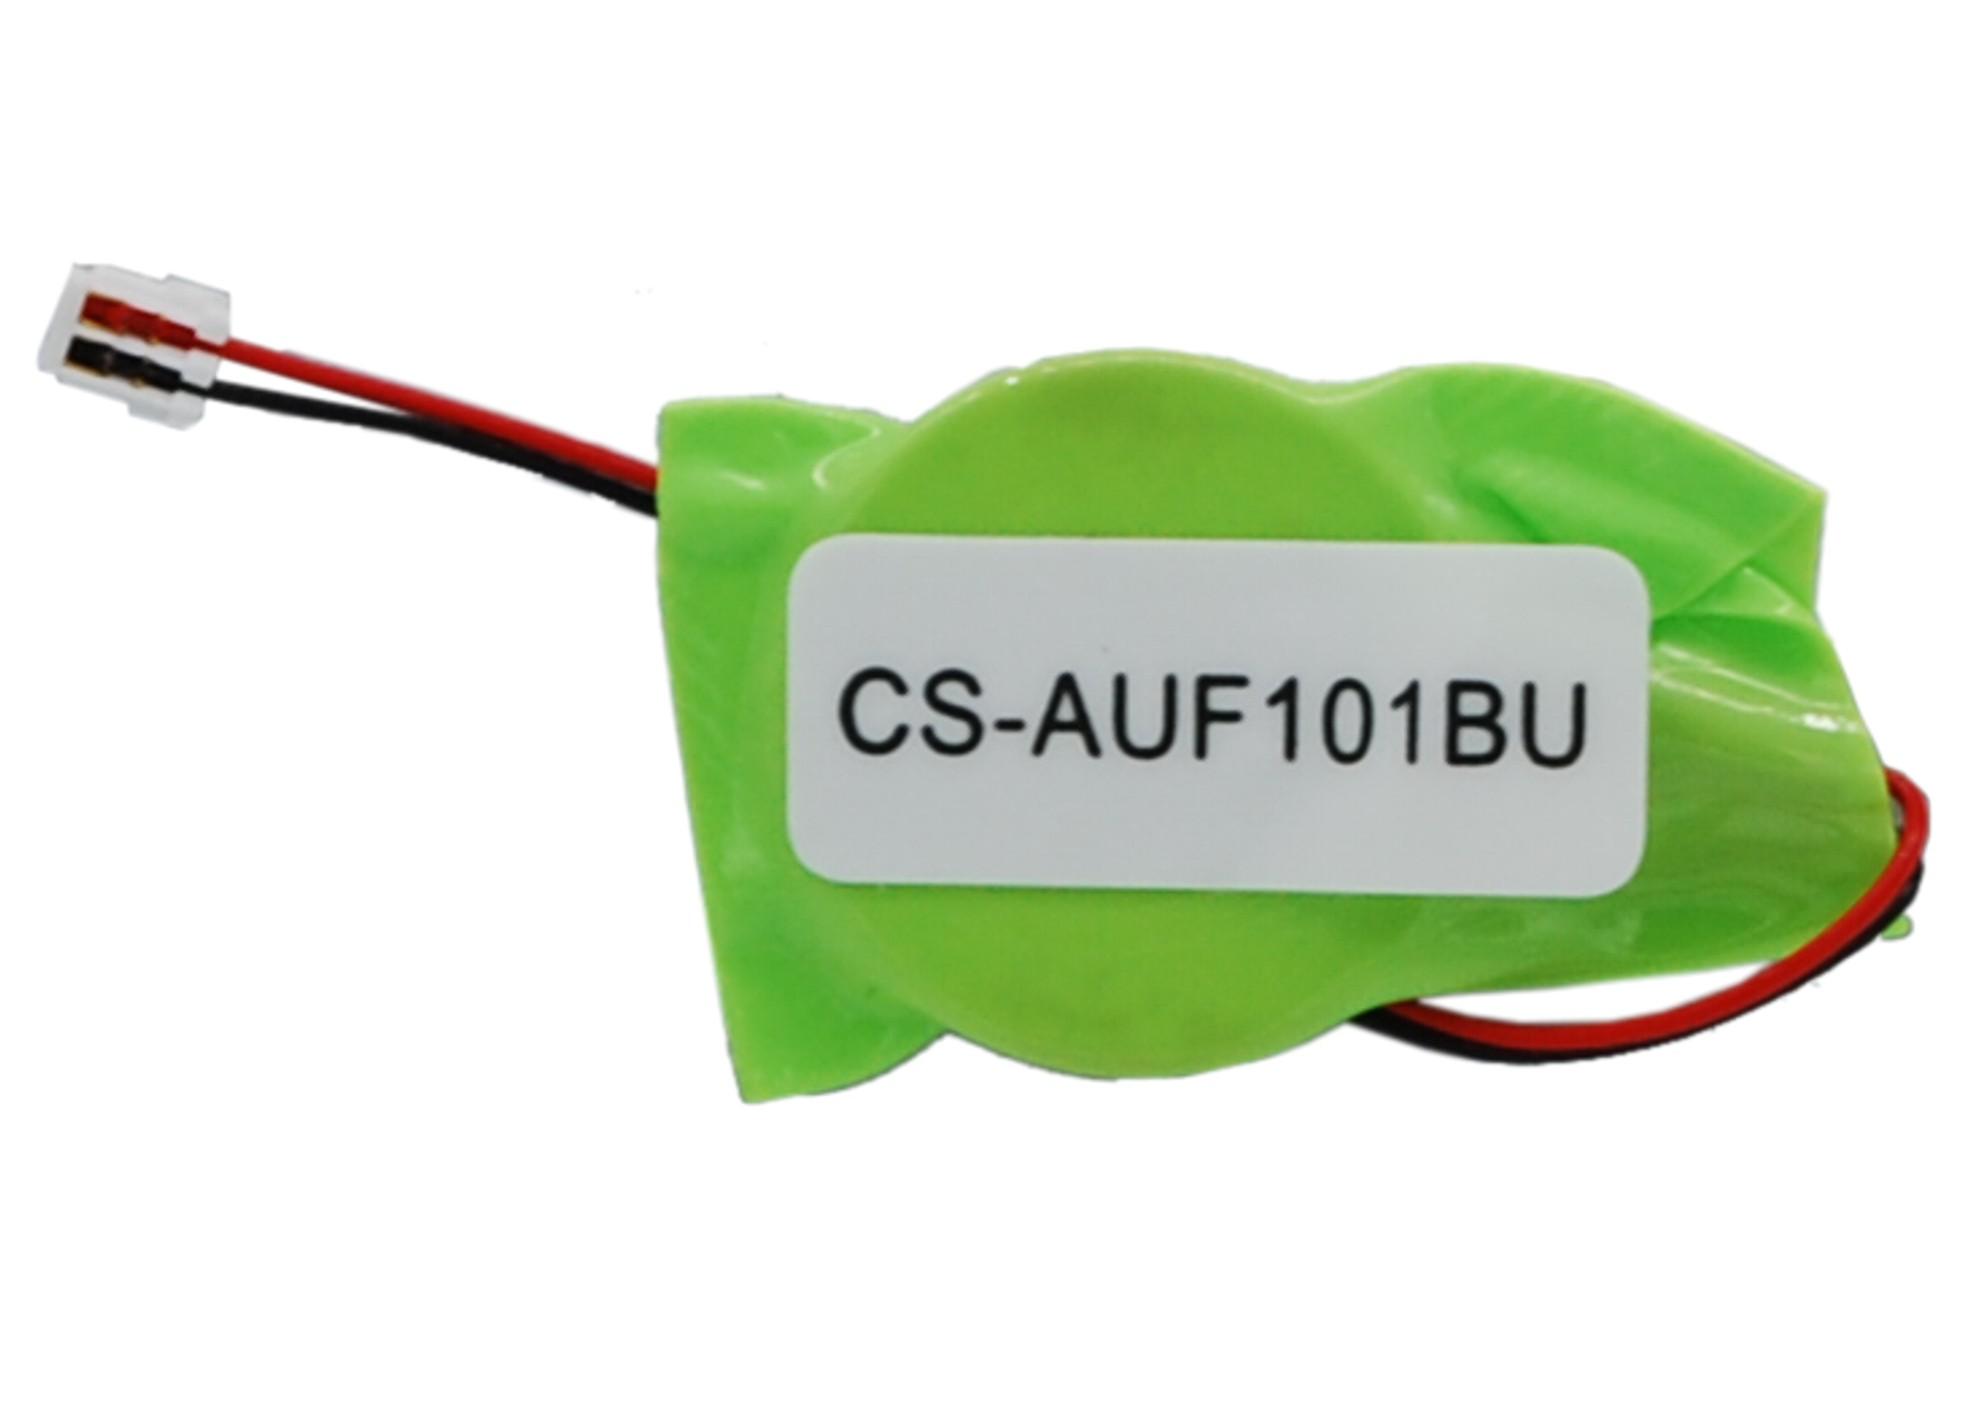 Cameron Sino baterie cmos pro ASUS Eee Pad Transformer TF101-1B011A 3V Li-ion 40mAh zelená - neoriginální